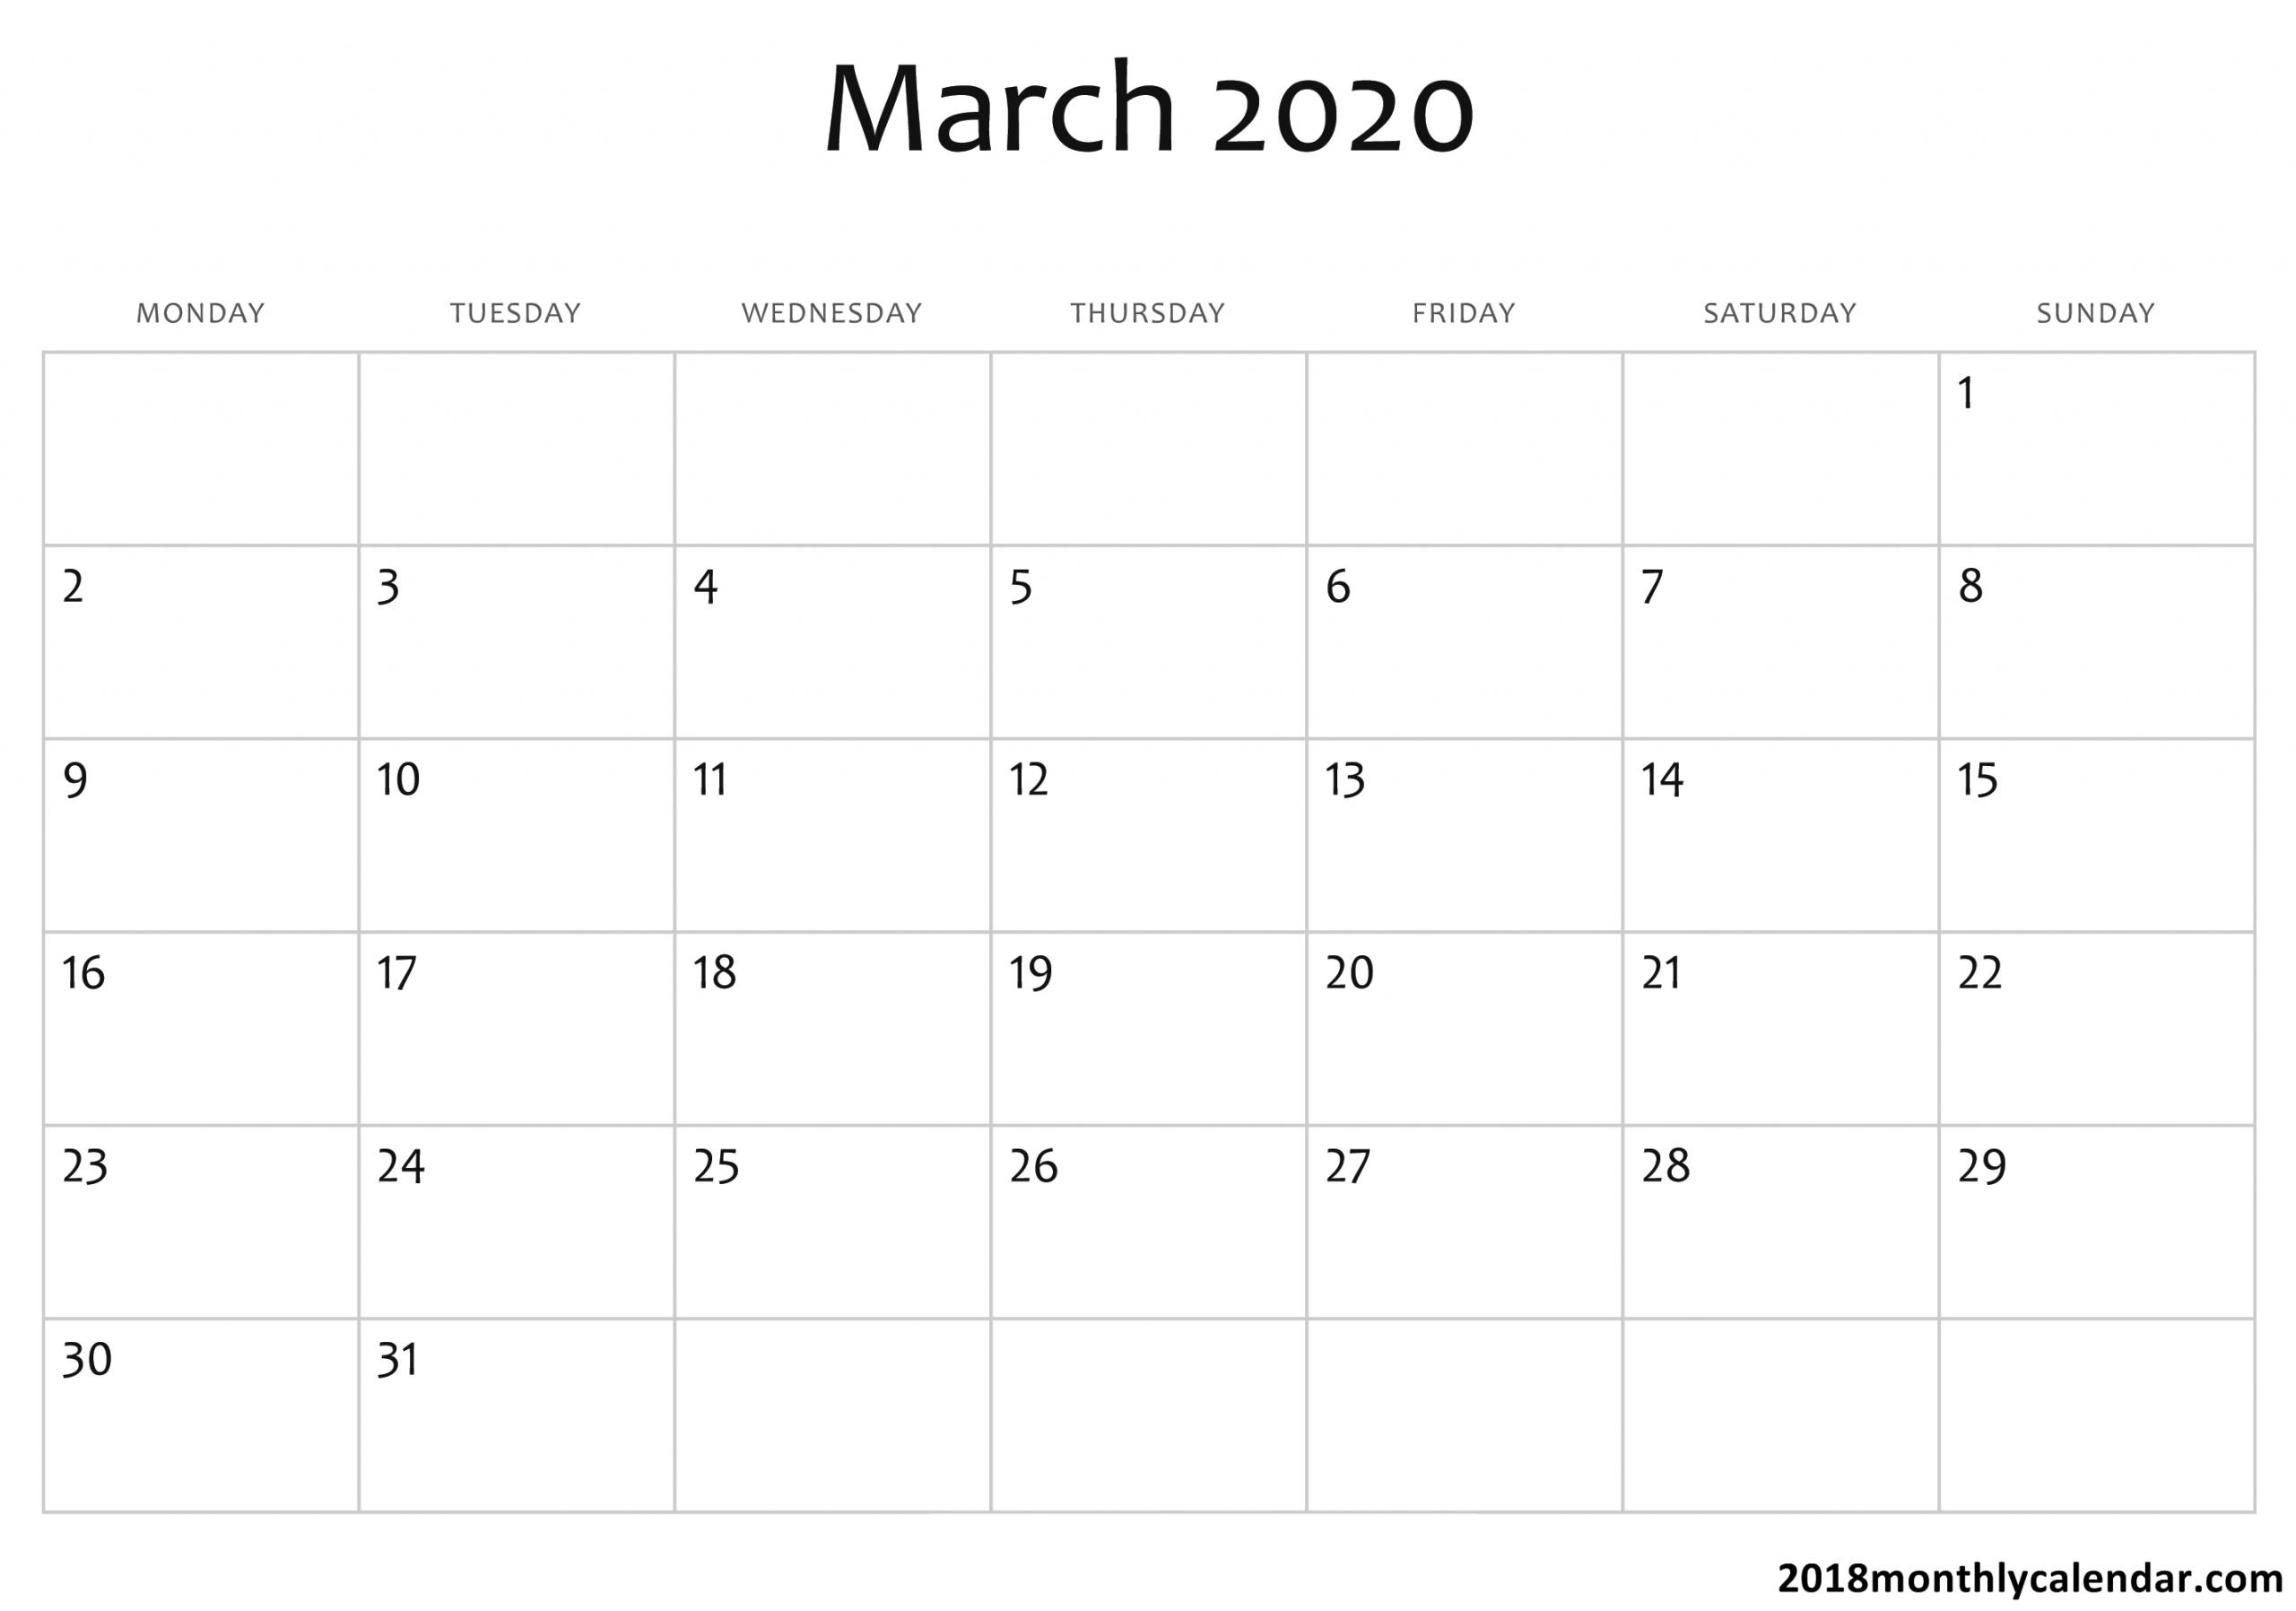 2020 Calendar You Can Edit | Calendar Printables Free Calender That Yopu Can Eedit